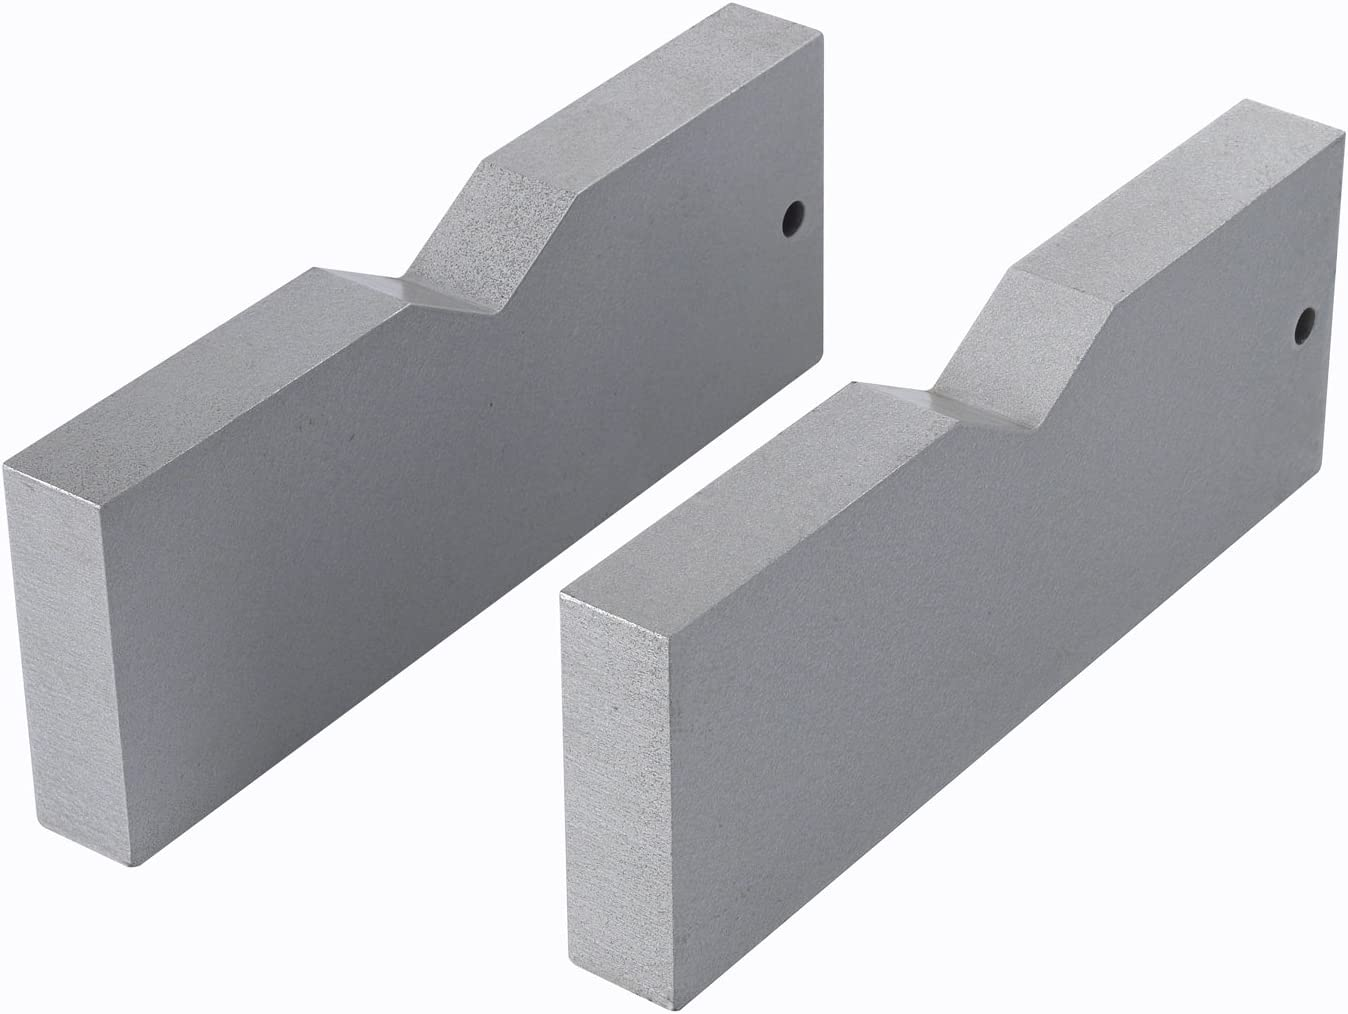 OTC 1893 V-Block Accessory Fixture for 100-Ton Capacity Shop Presses - Pair: Automotive